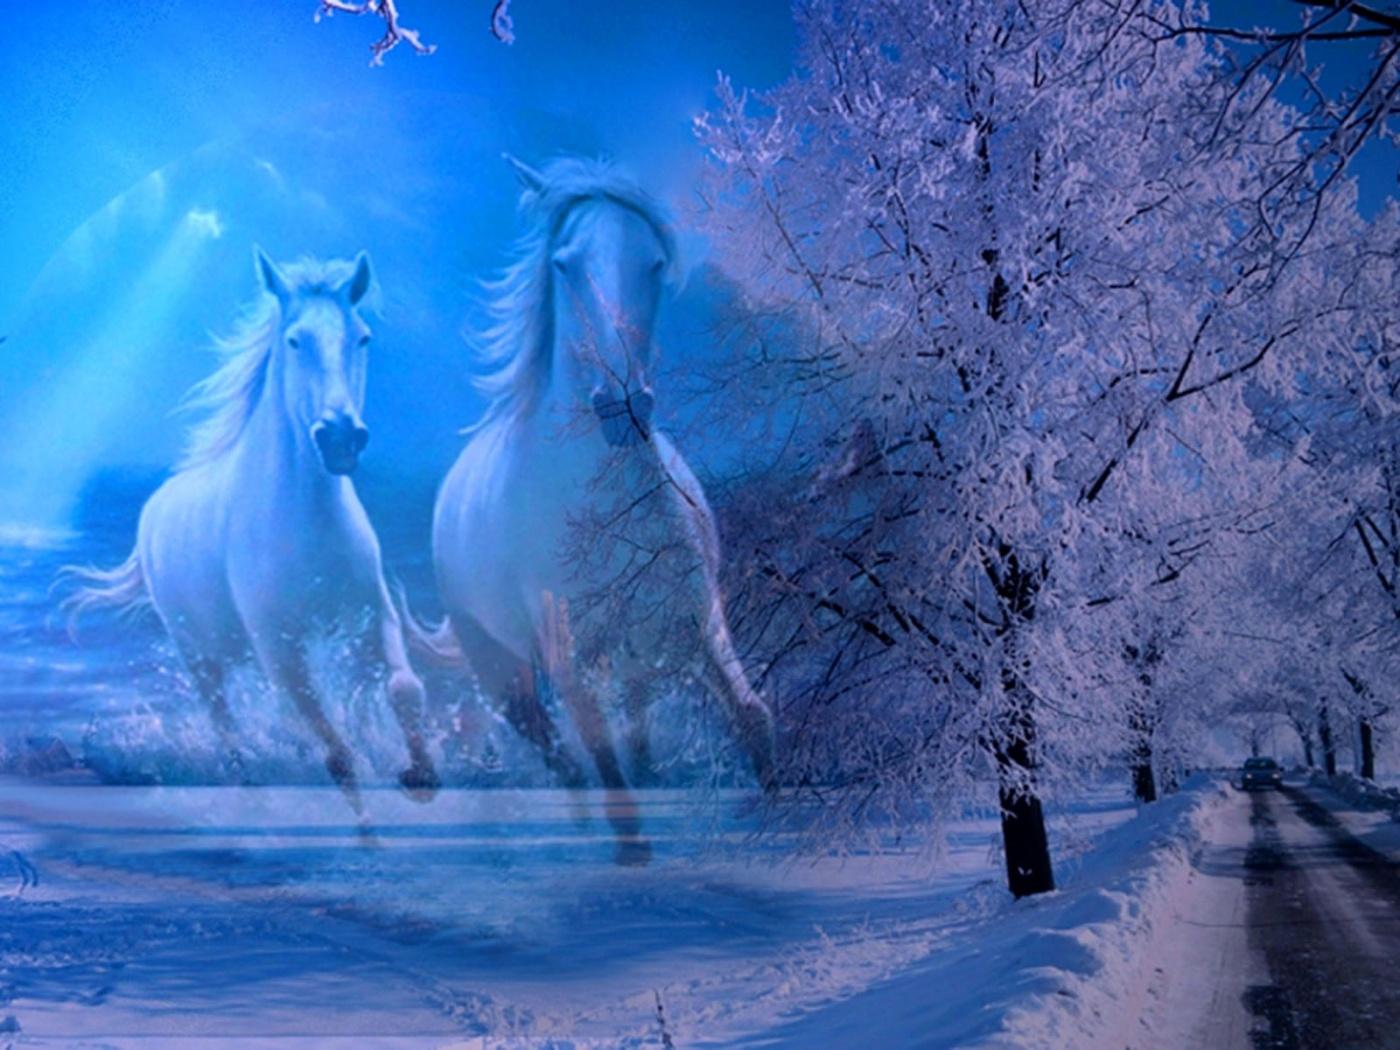 Winter horse wallpaper desktop wallpapersafari - Wallpaper hd nature winter ...